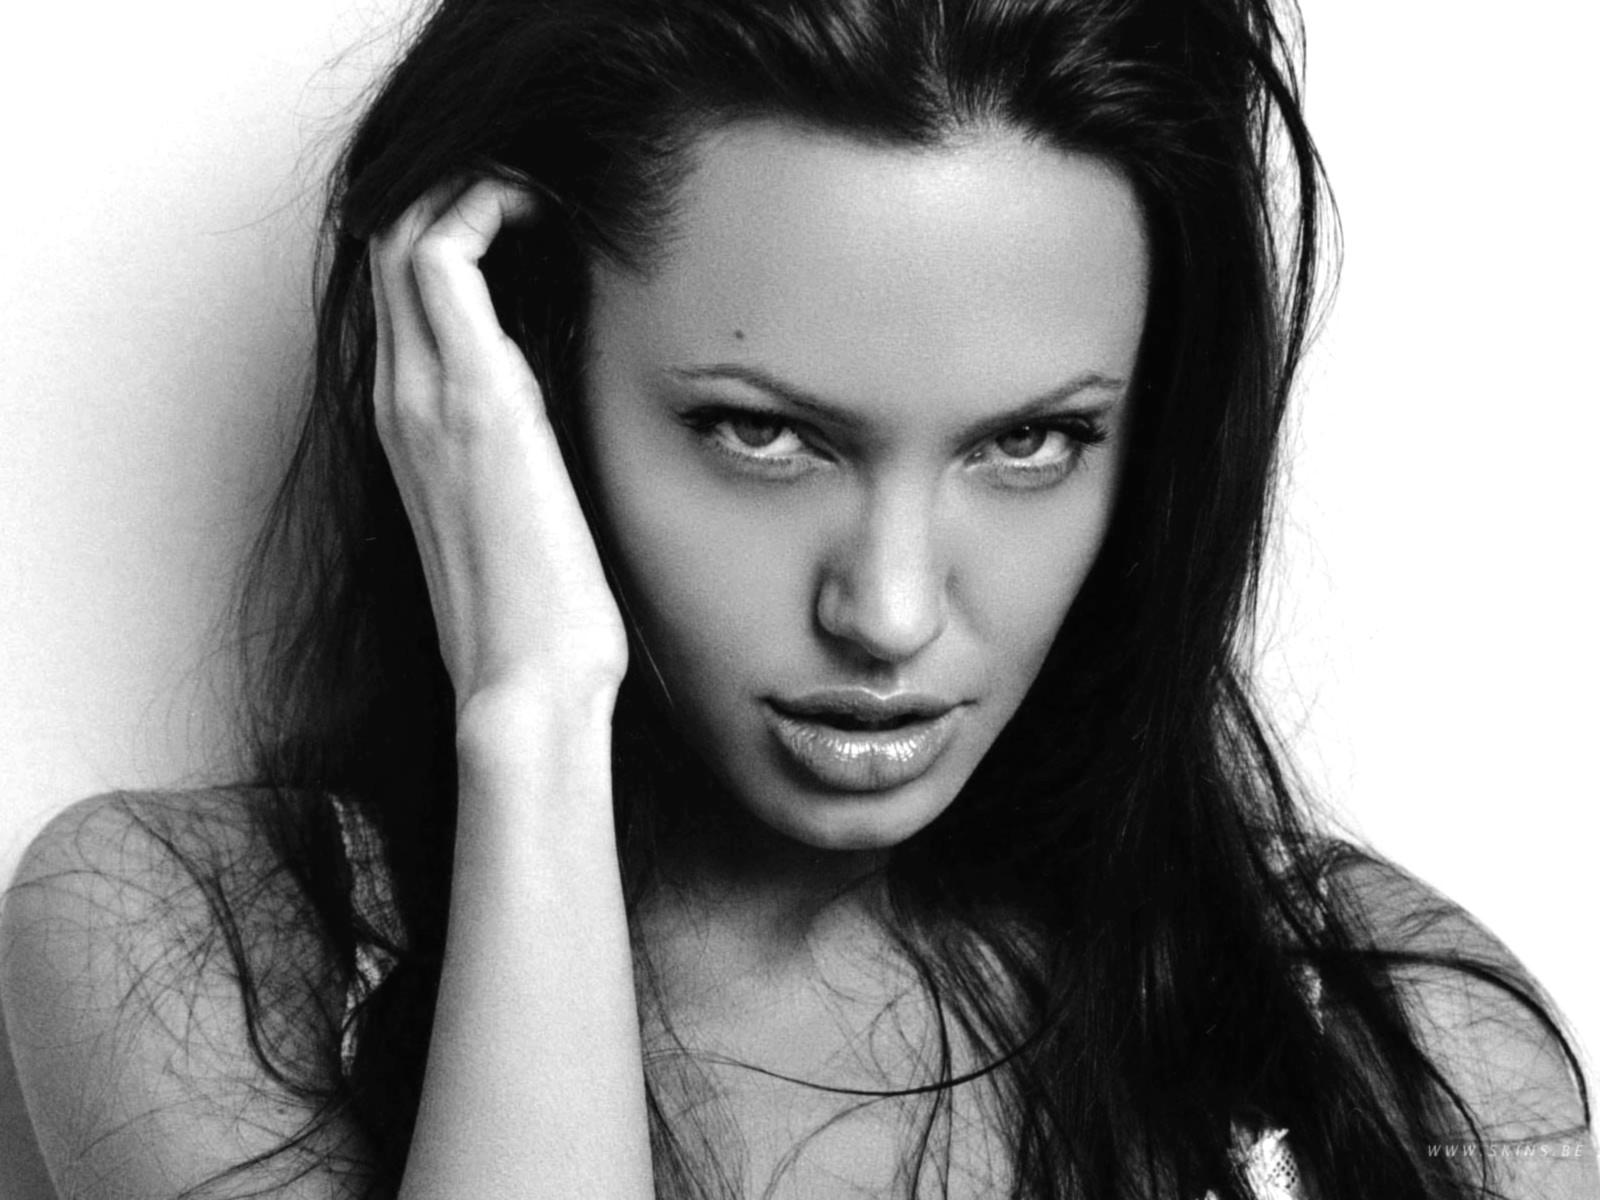 Angelina Jolie - Angelina Jolie Photo (178992) - Fanpop анджелина джоли сейчас